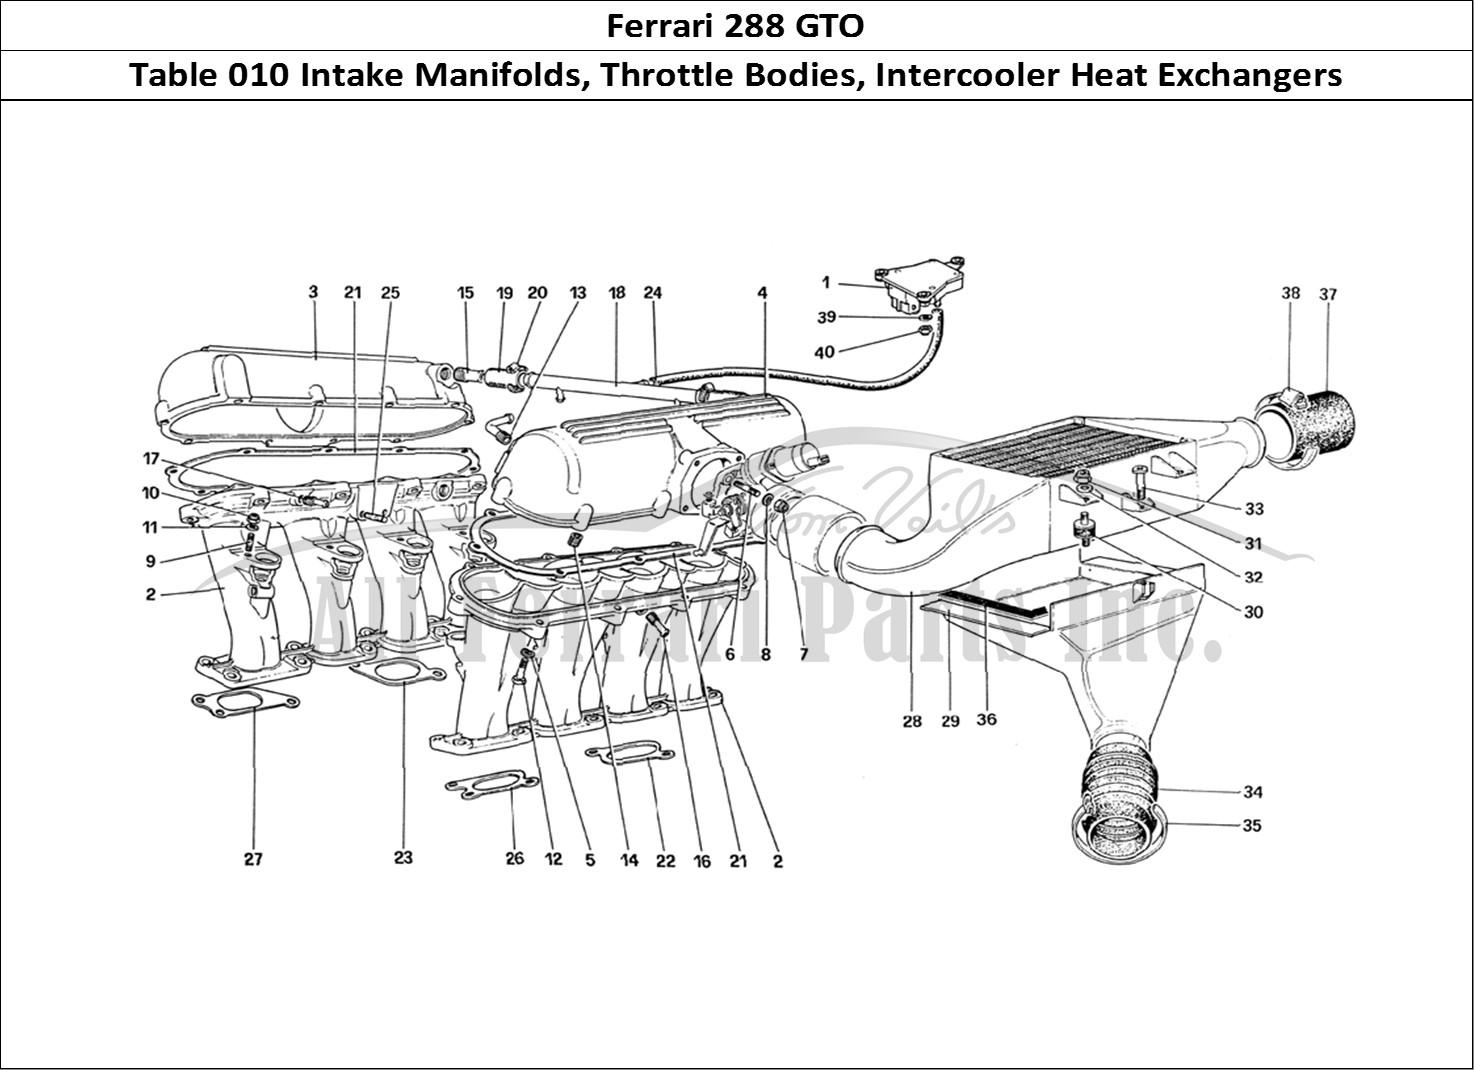 hight resolution of ferrari 288 gto mechanical table 010 intake manifolds throttle bodies intercooler heat exchangers